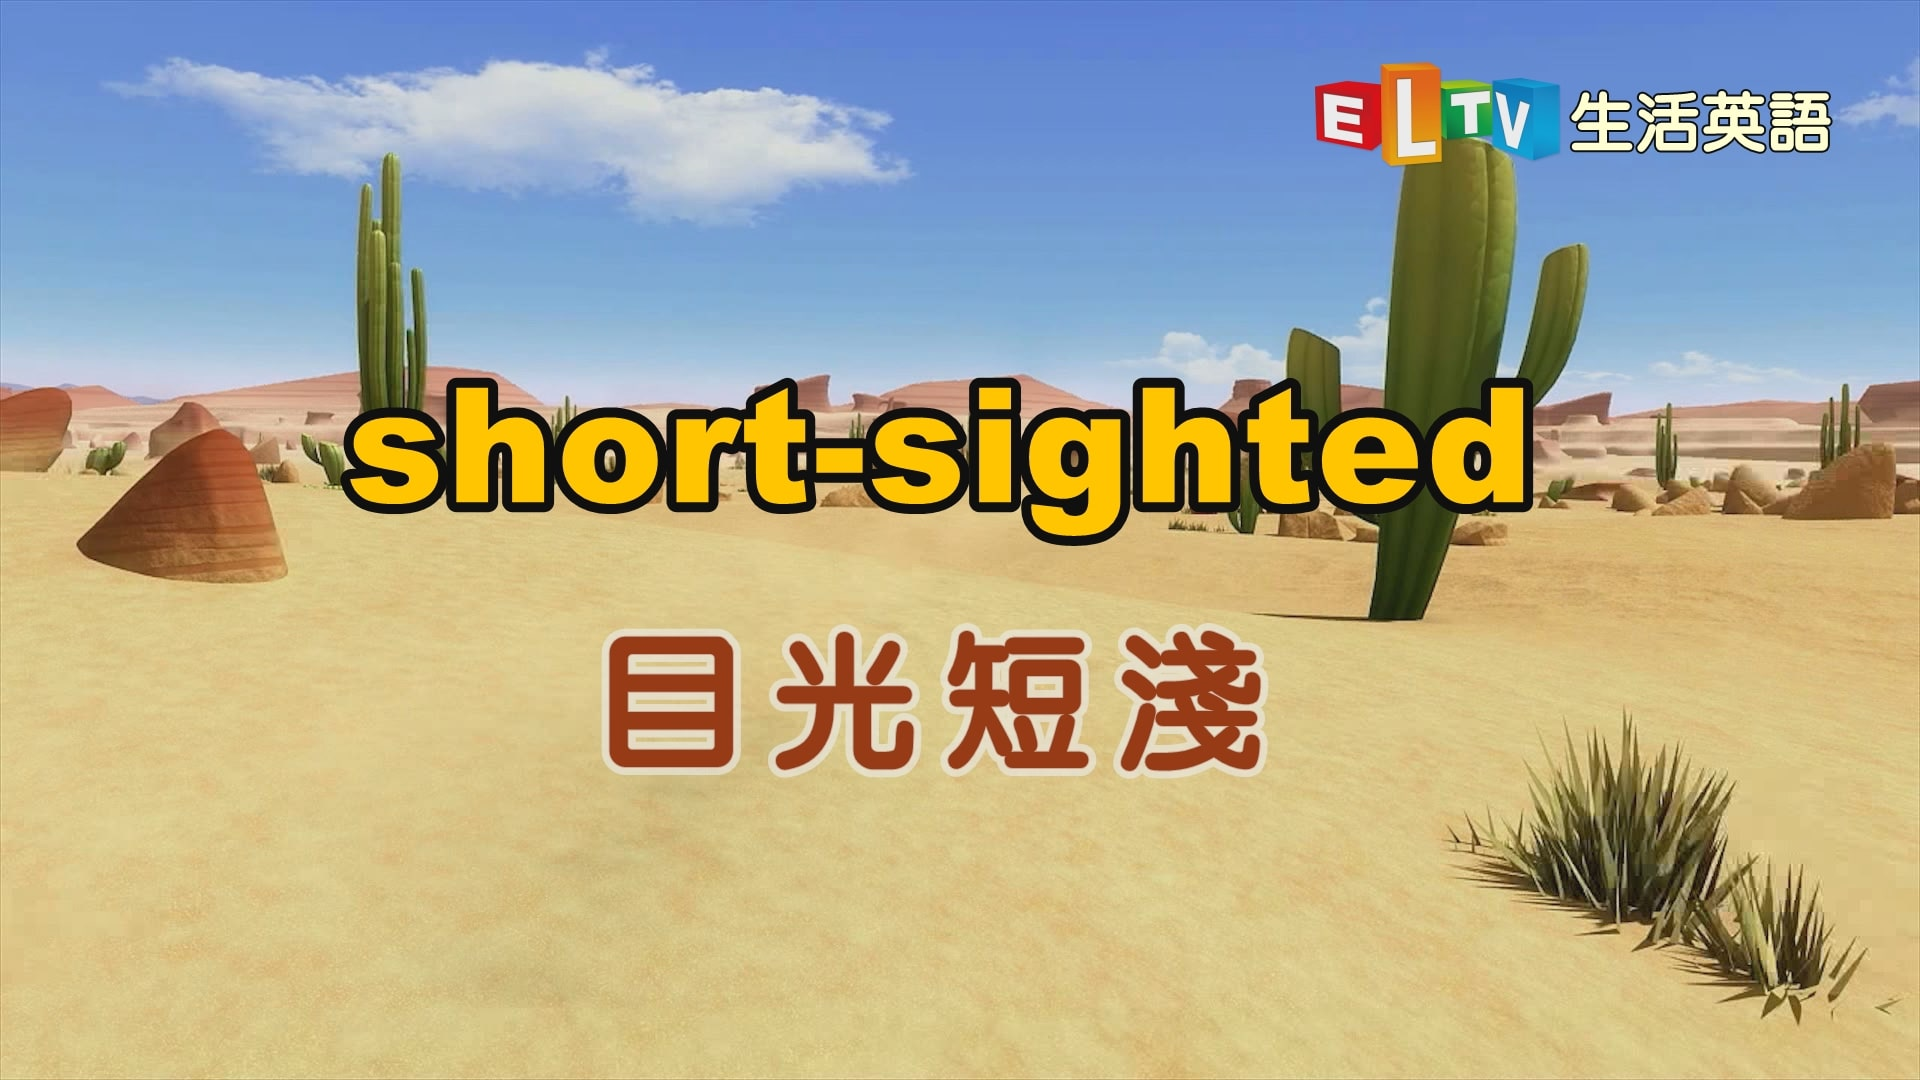 「short-sighted」 目光短淺